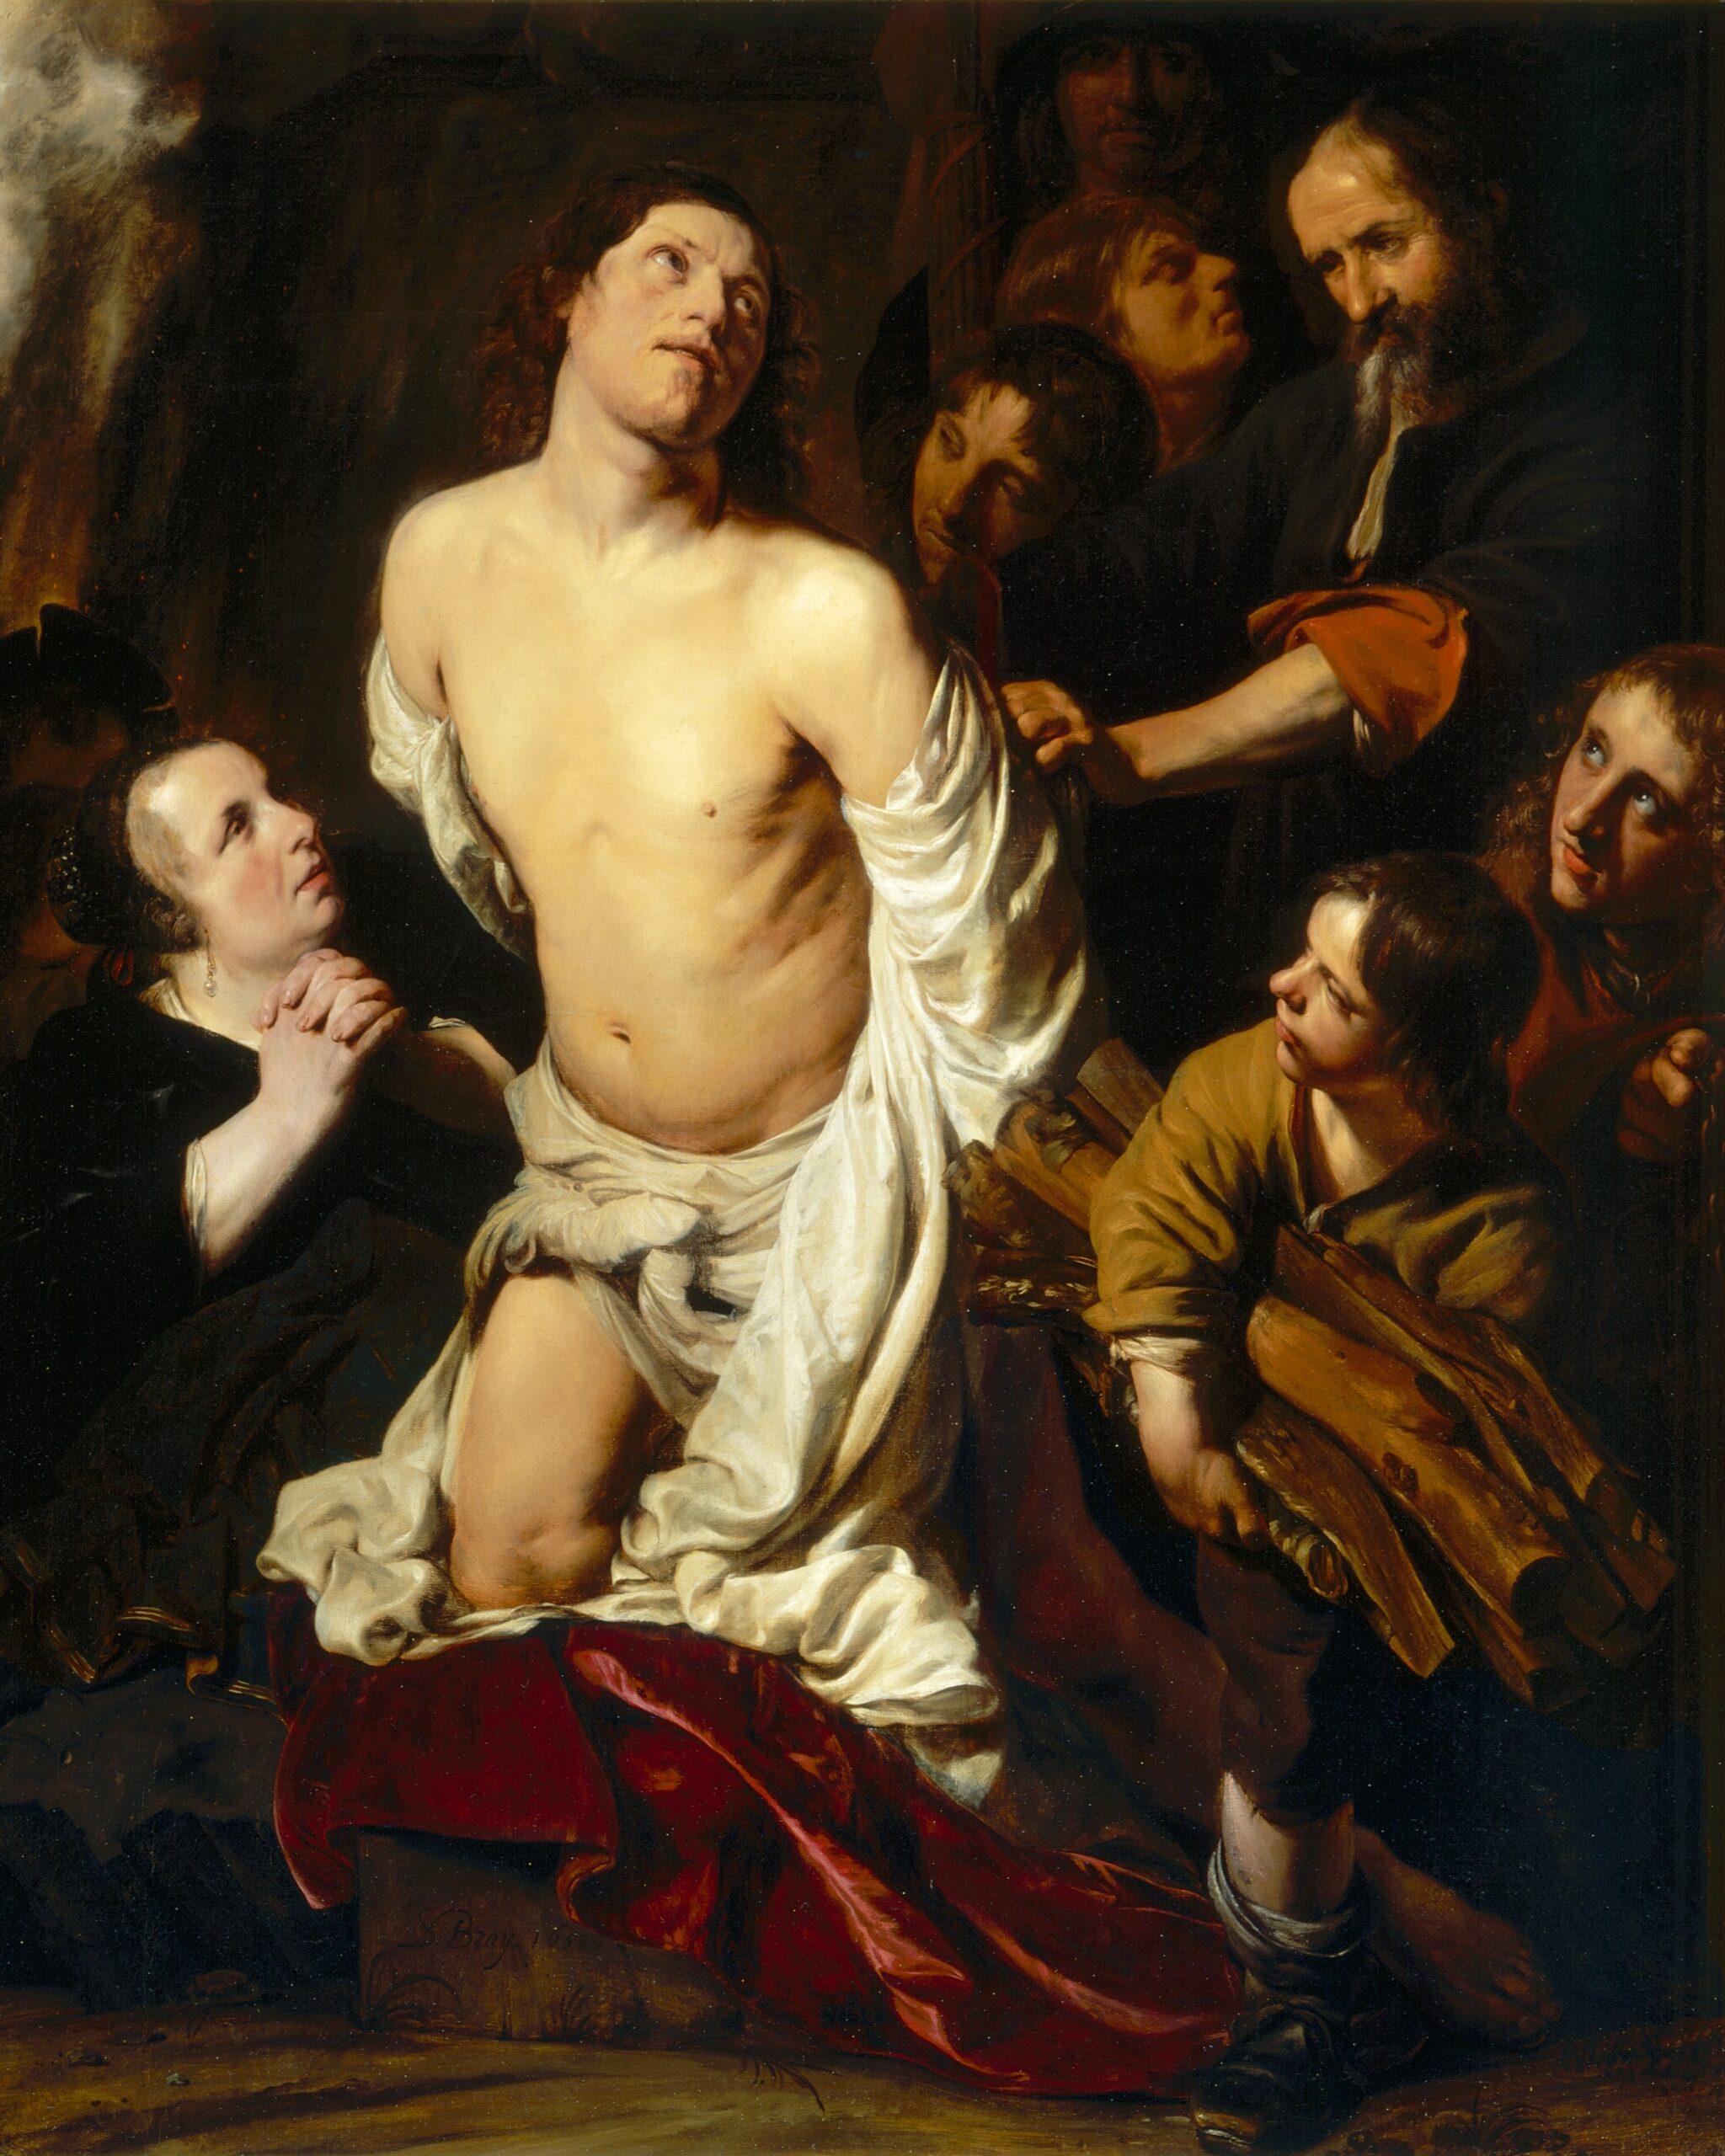 Salomon de Bray (1597-1664), <em>The Martyrdom of Saint Lawrence</em>, 1652<br>Los Angeles County Museum of Art, Los Angeles © LACMA